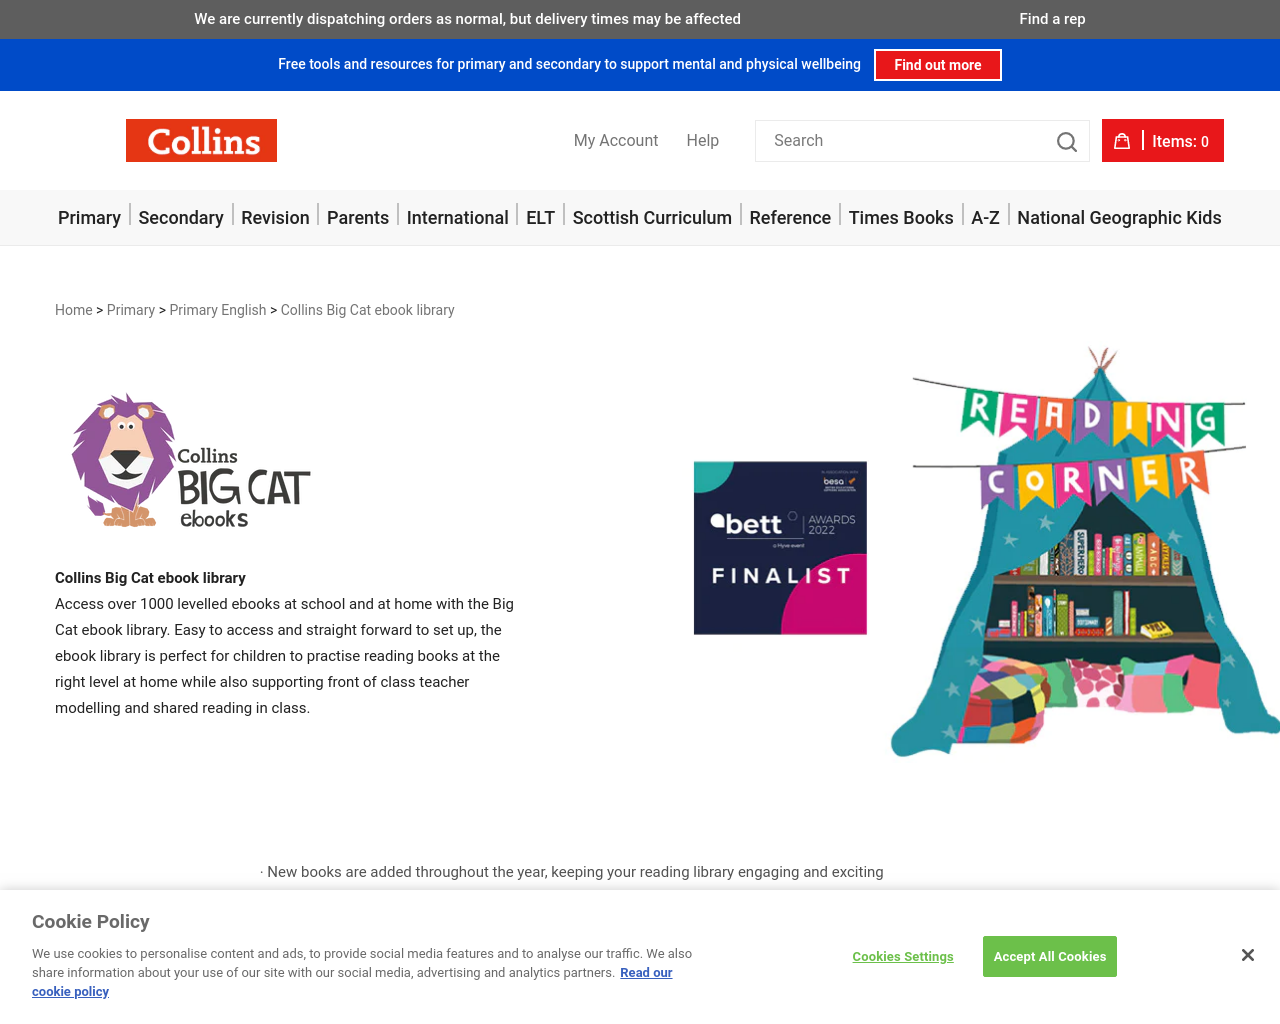 Big Cat free ebooks